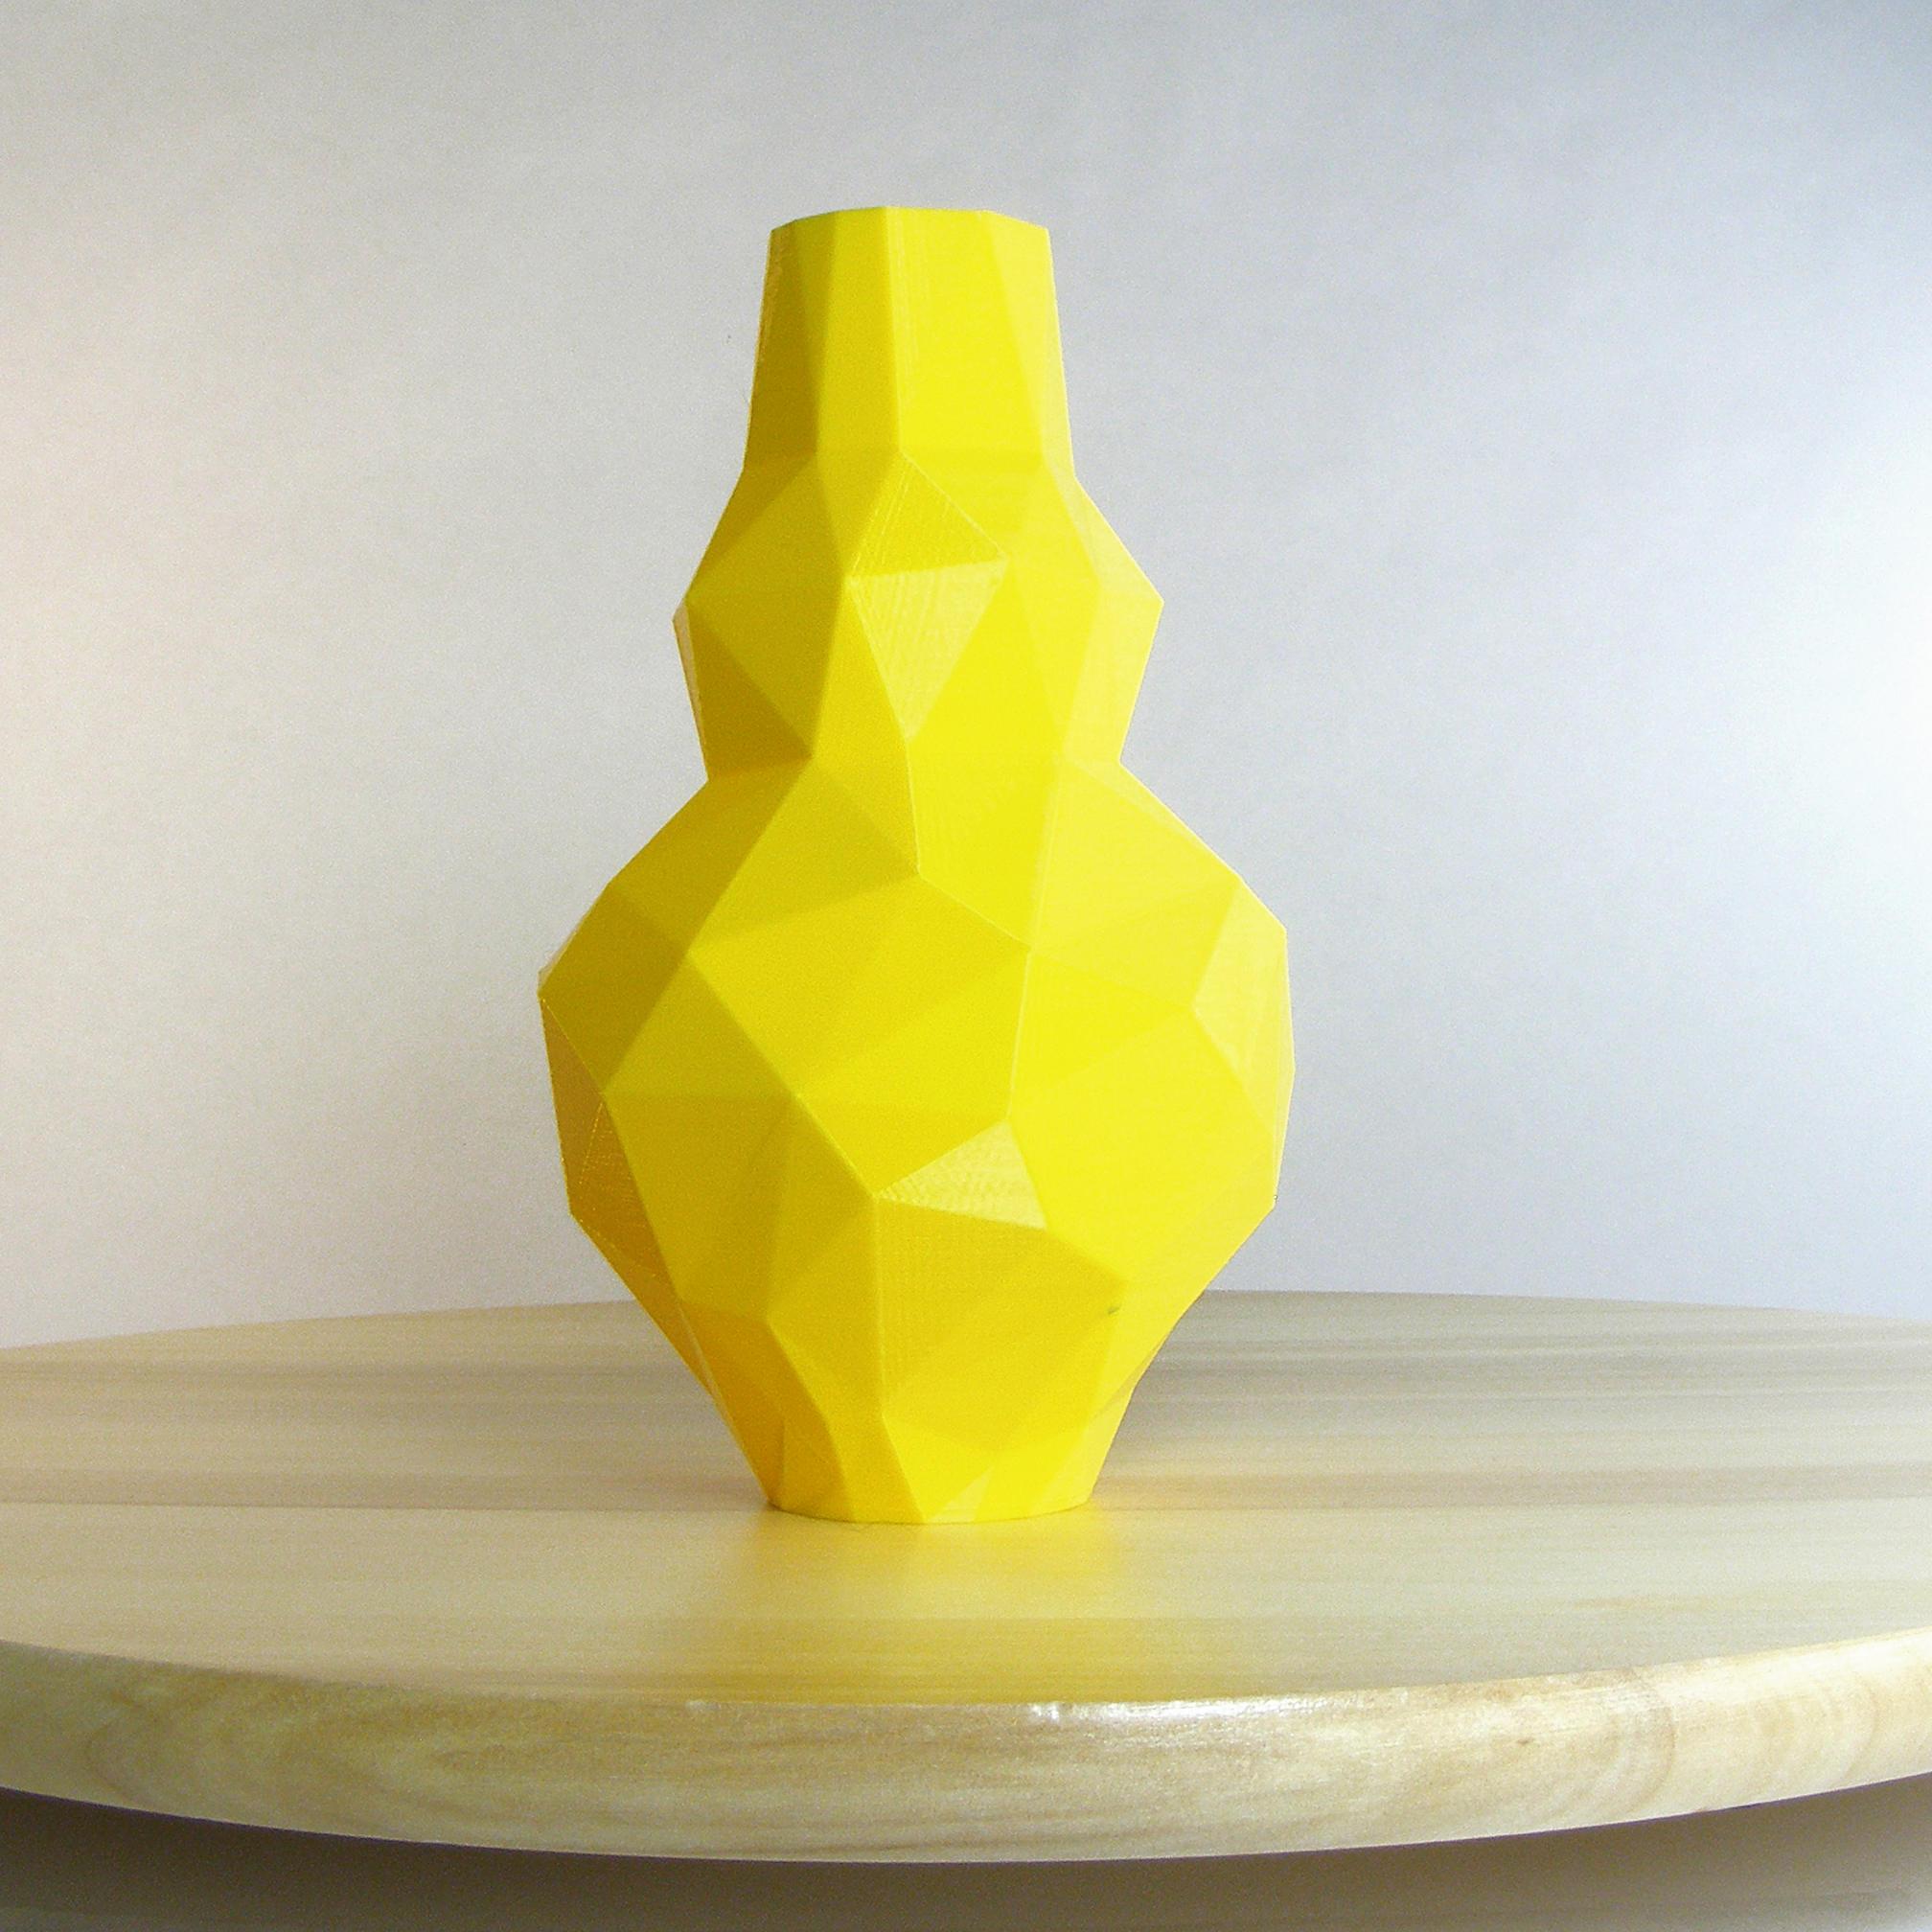 Lemon Yellow Vase 3D Printed Vase Low Poly Yellow Decor Yellow